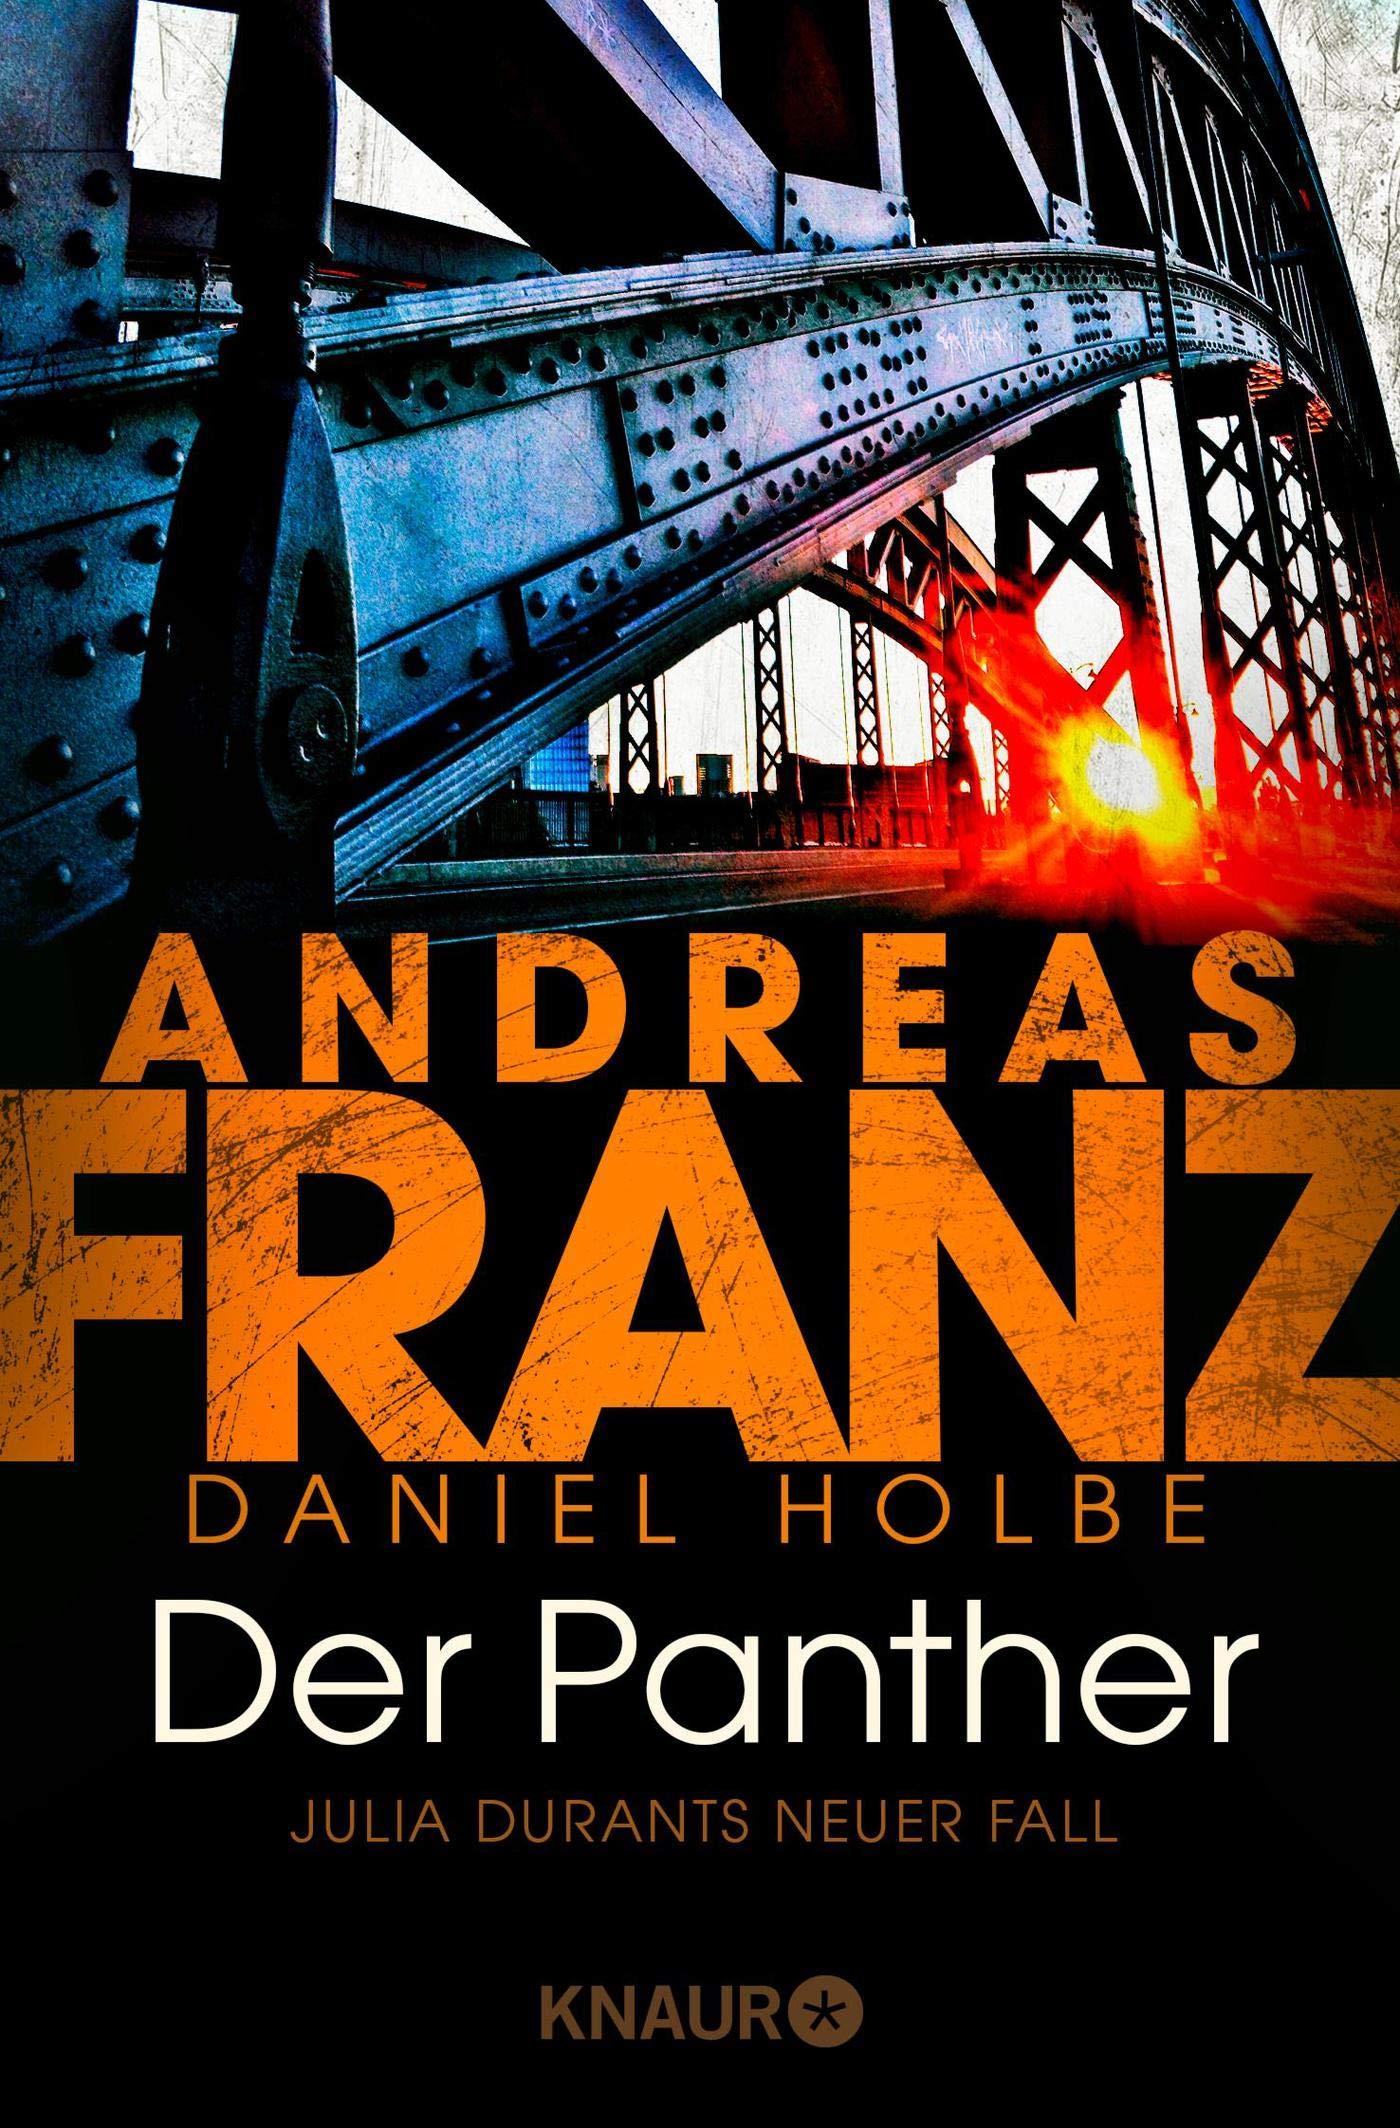 Der Panther: Julia Durants neuer Fall (Julia Durant ermittelt, Band 19) Taschenbuch – 20. August 2019 Andreas Franz Daniel Holbe Knaur TB 3426520850